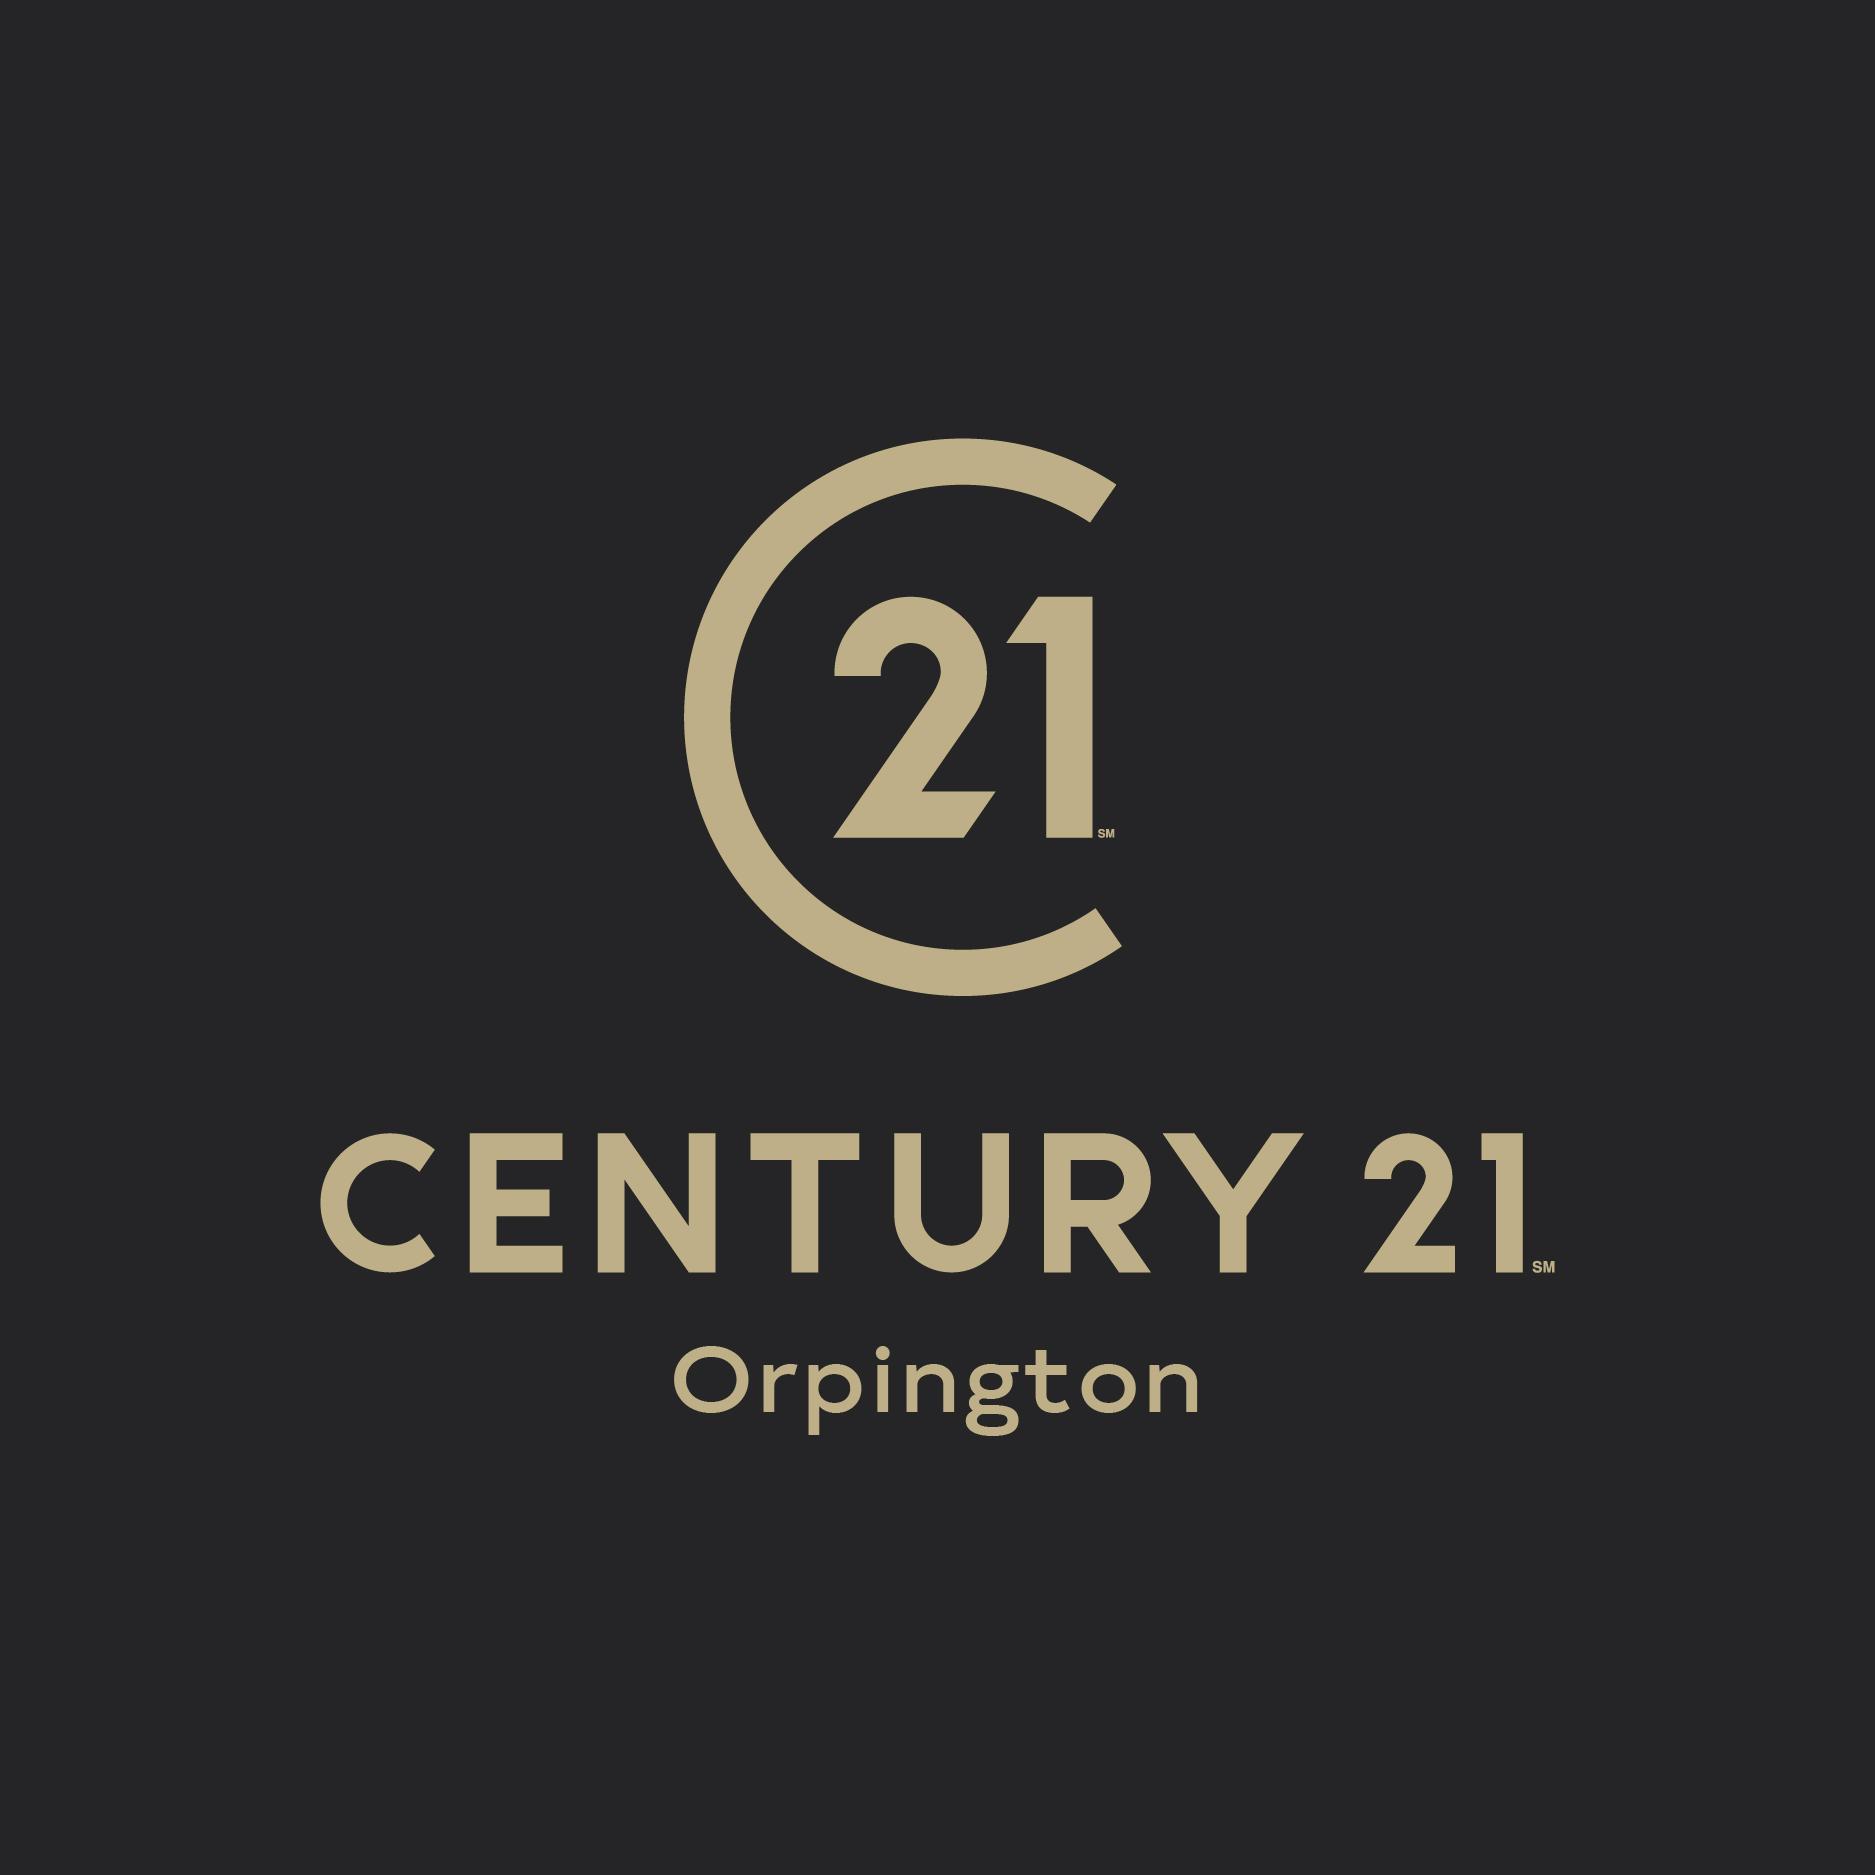 Century 21 - Orpington